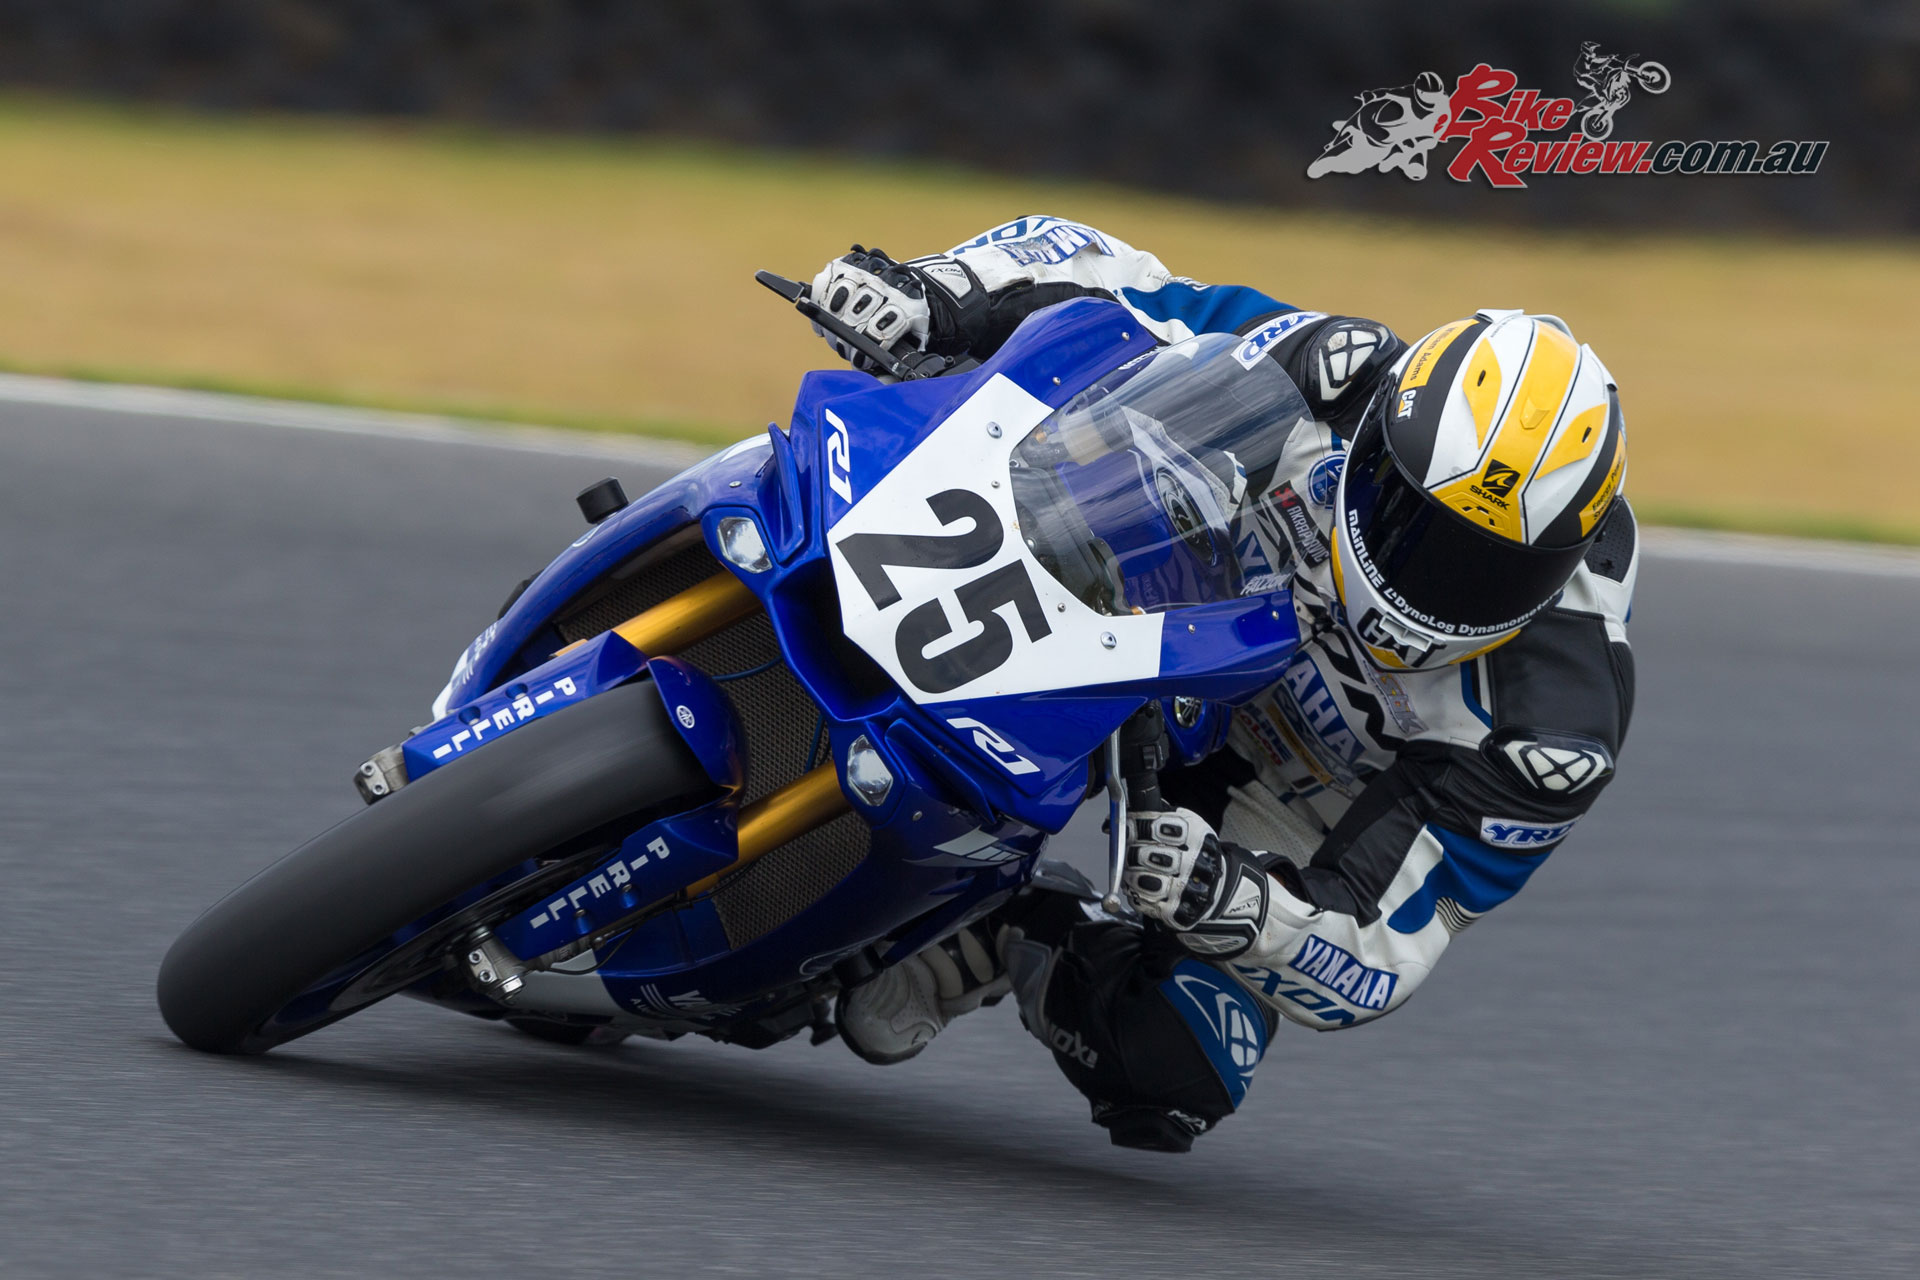 Wayne Maxwell - Image by TBG Sport